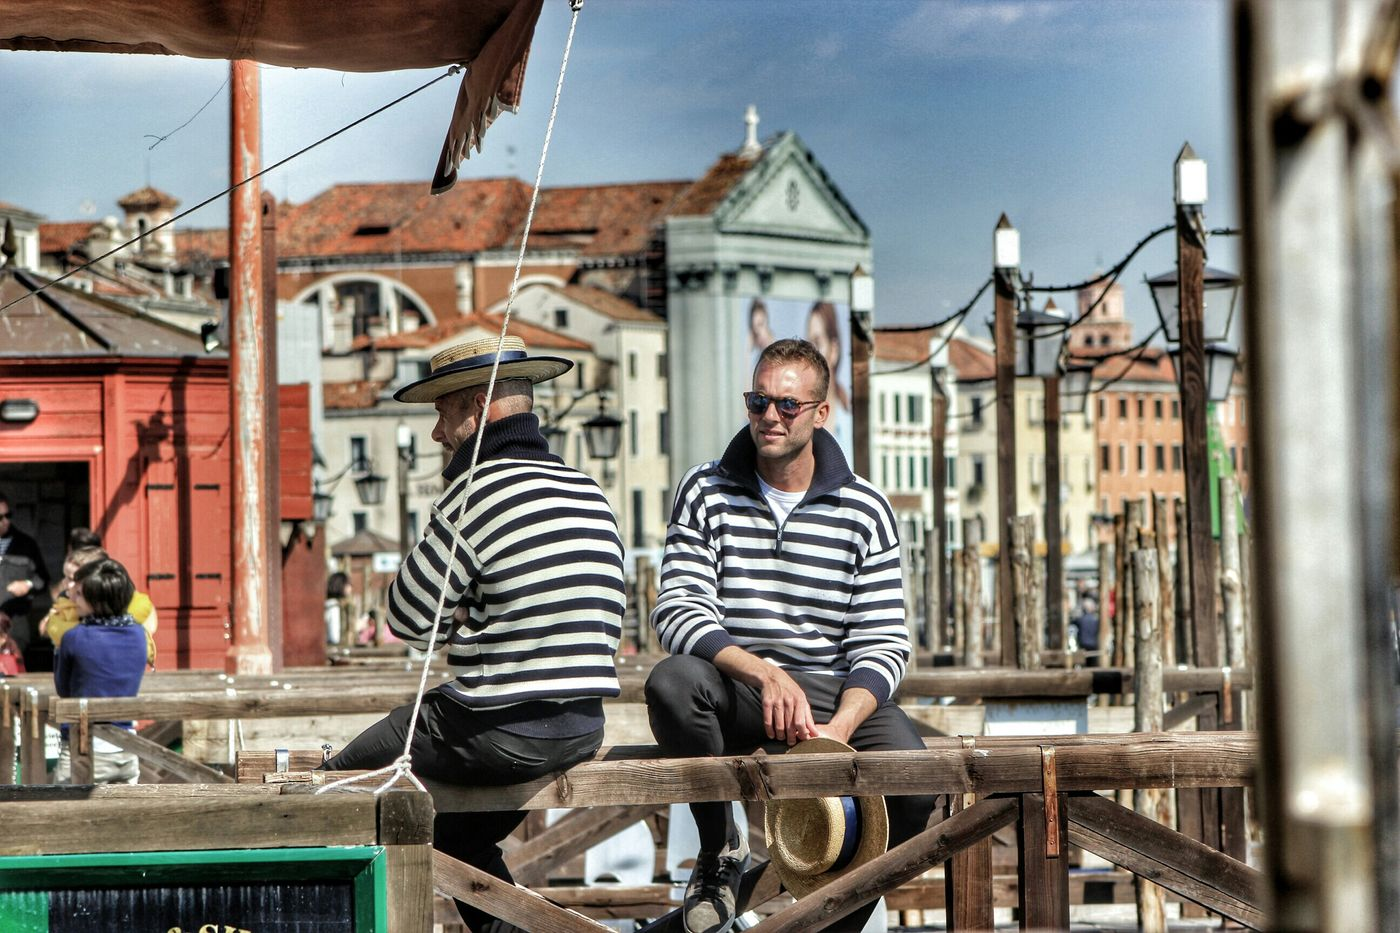 Venice Venezia Italia Venezia Venezia - Gondolieri Si Riposano